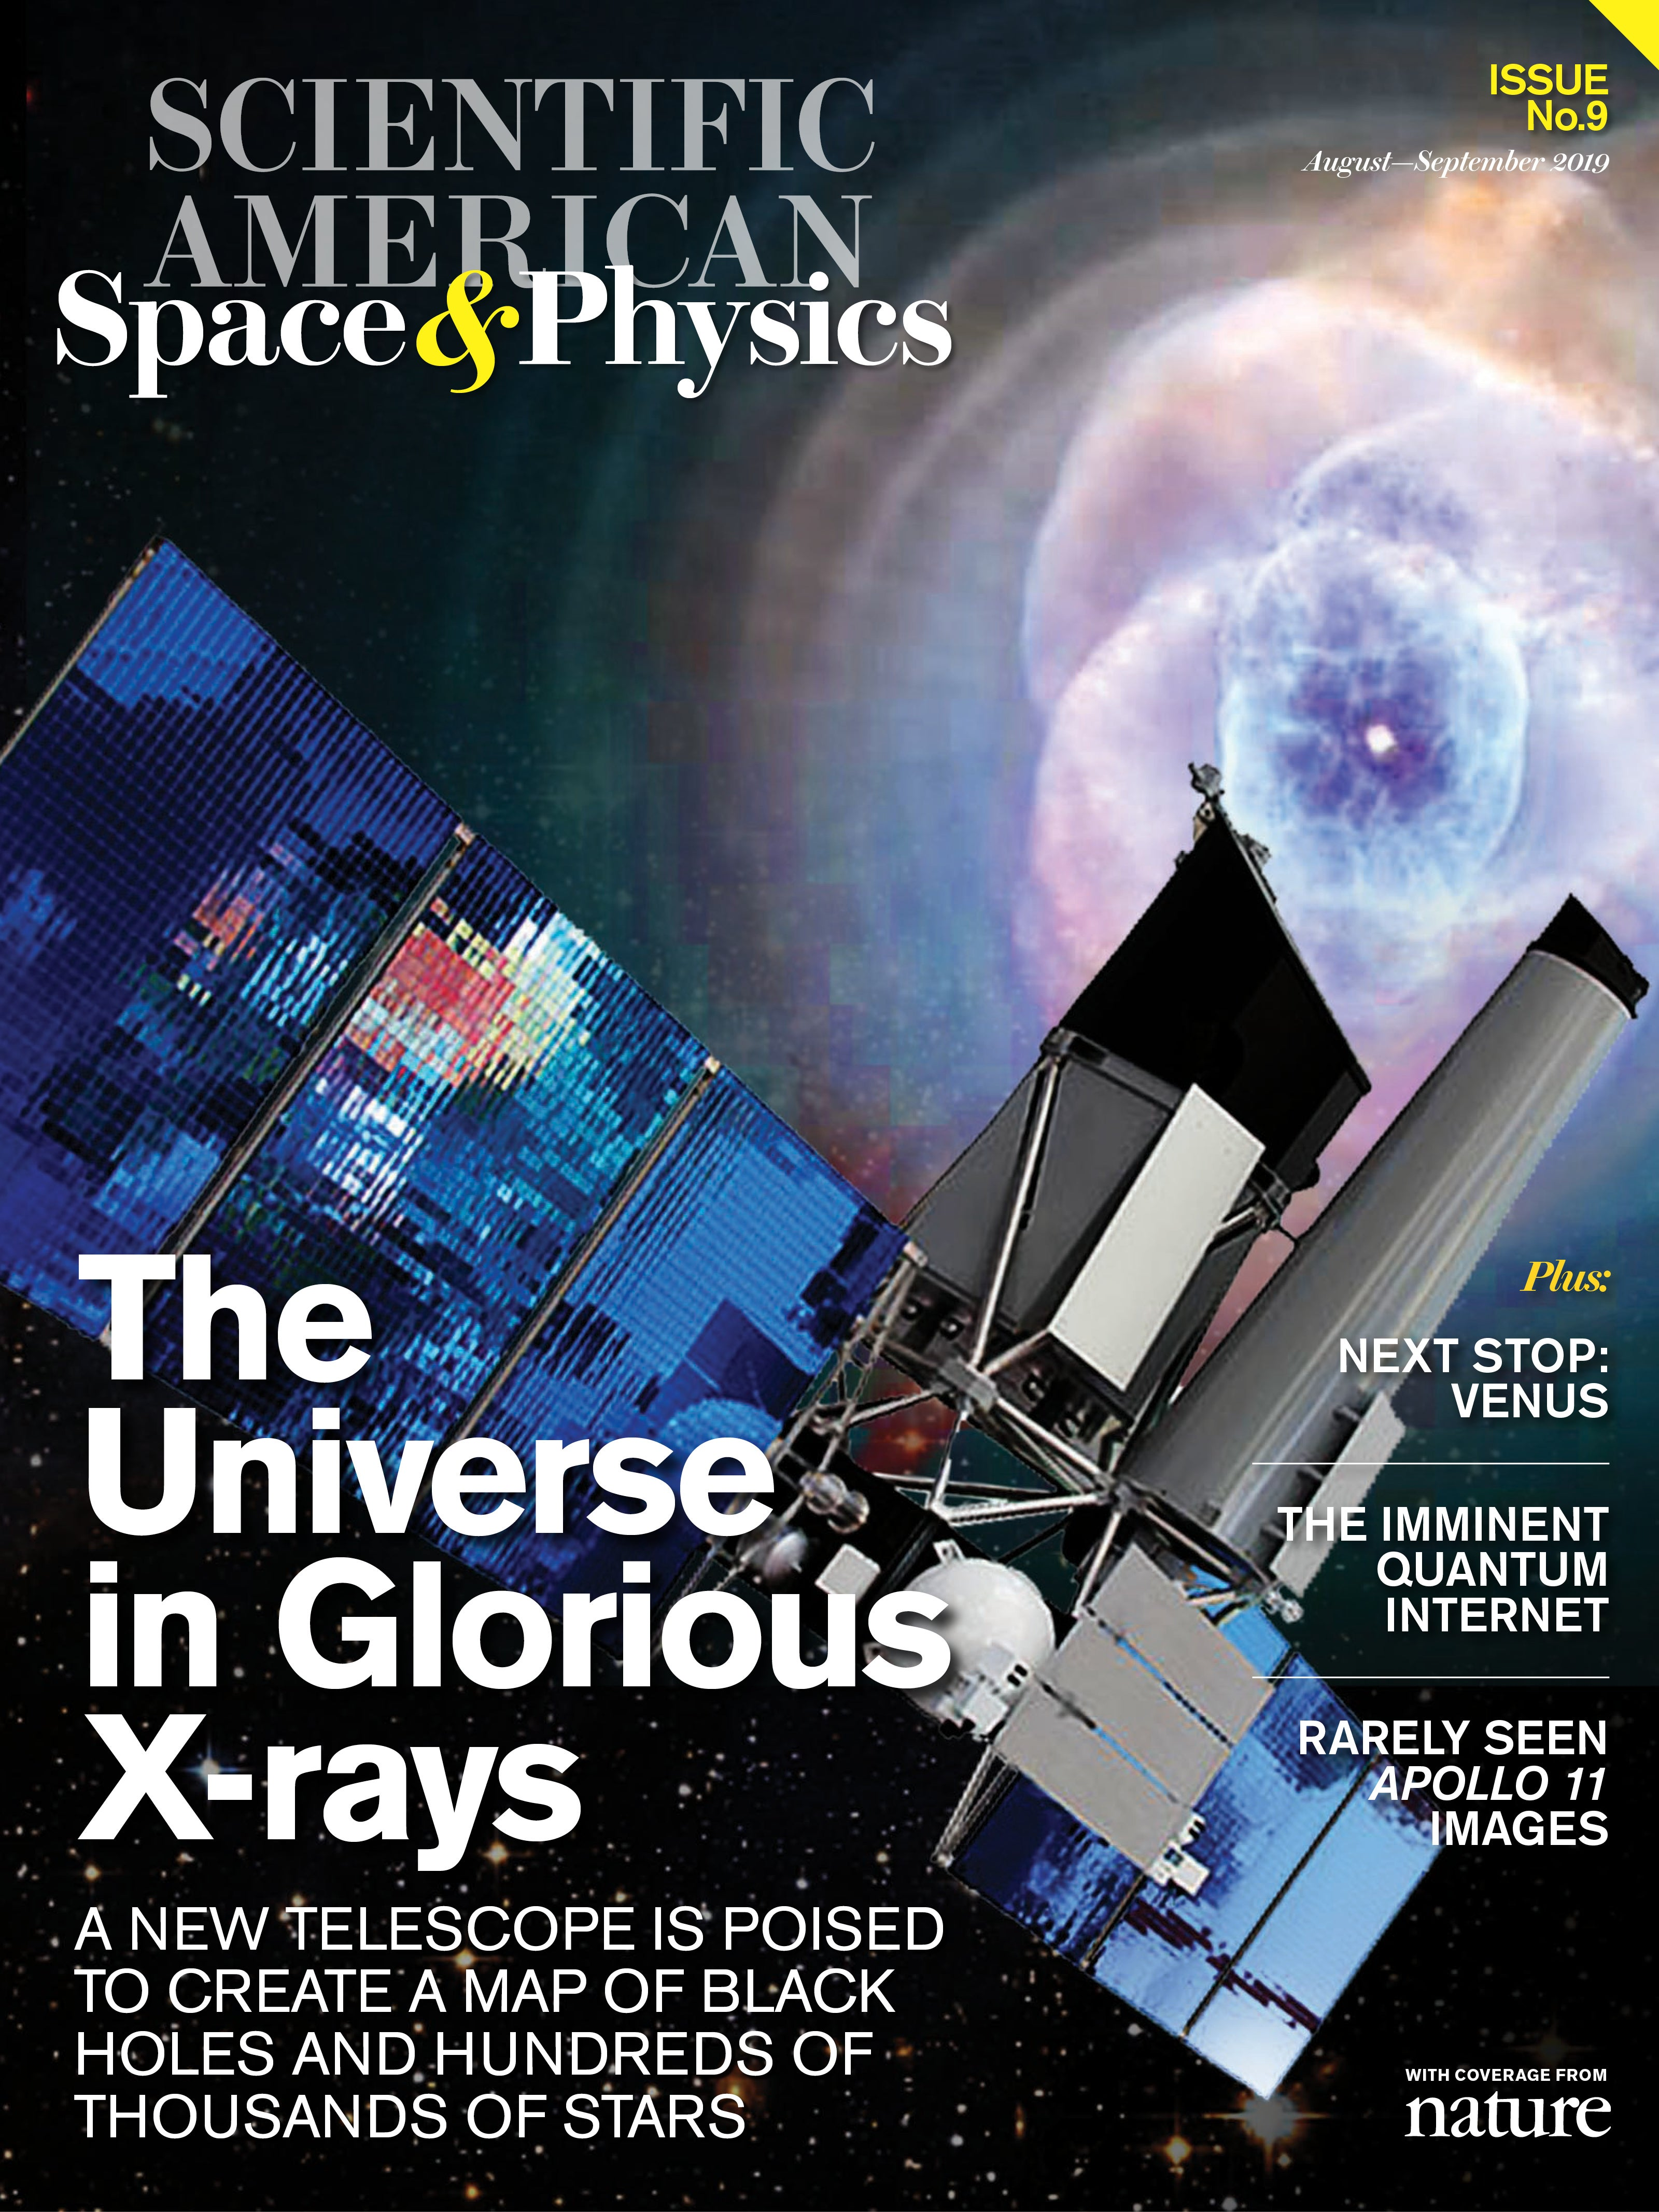 Scientific American Space & Physics, Volume 2, Issue 4